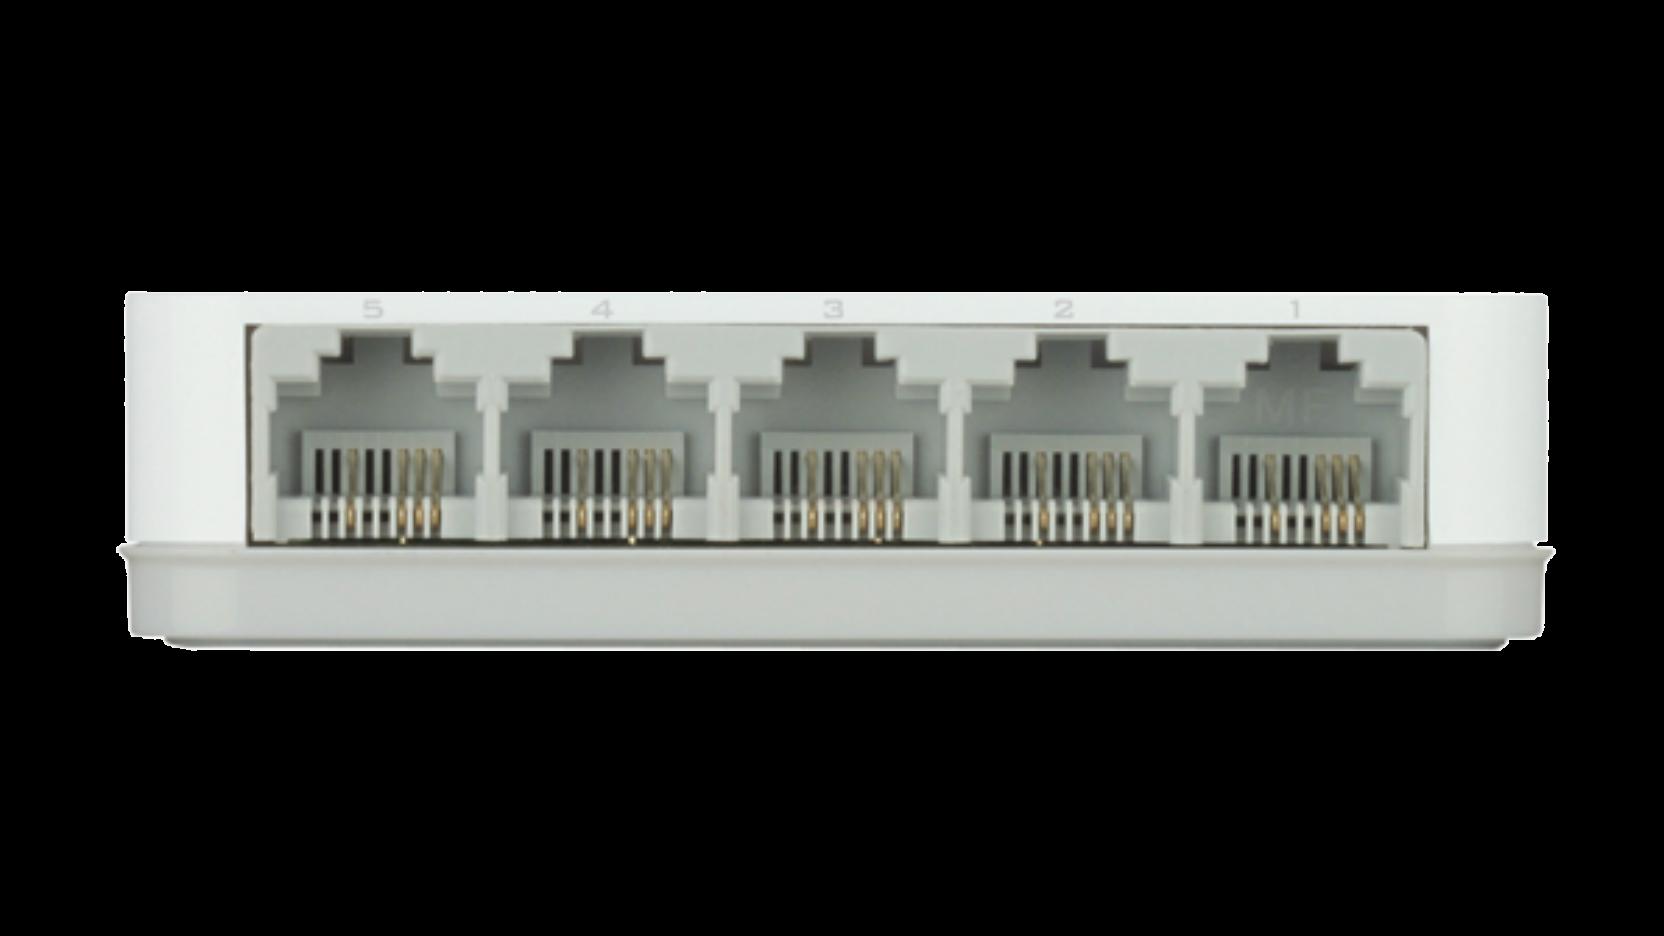 D-Link 5-Port GO-SW-5E Switch